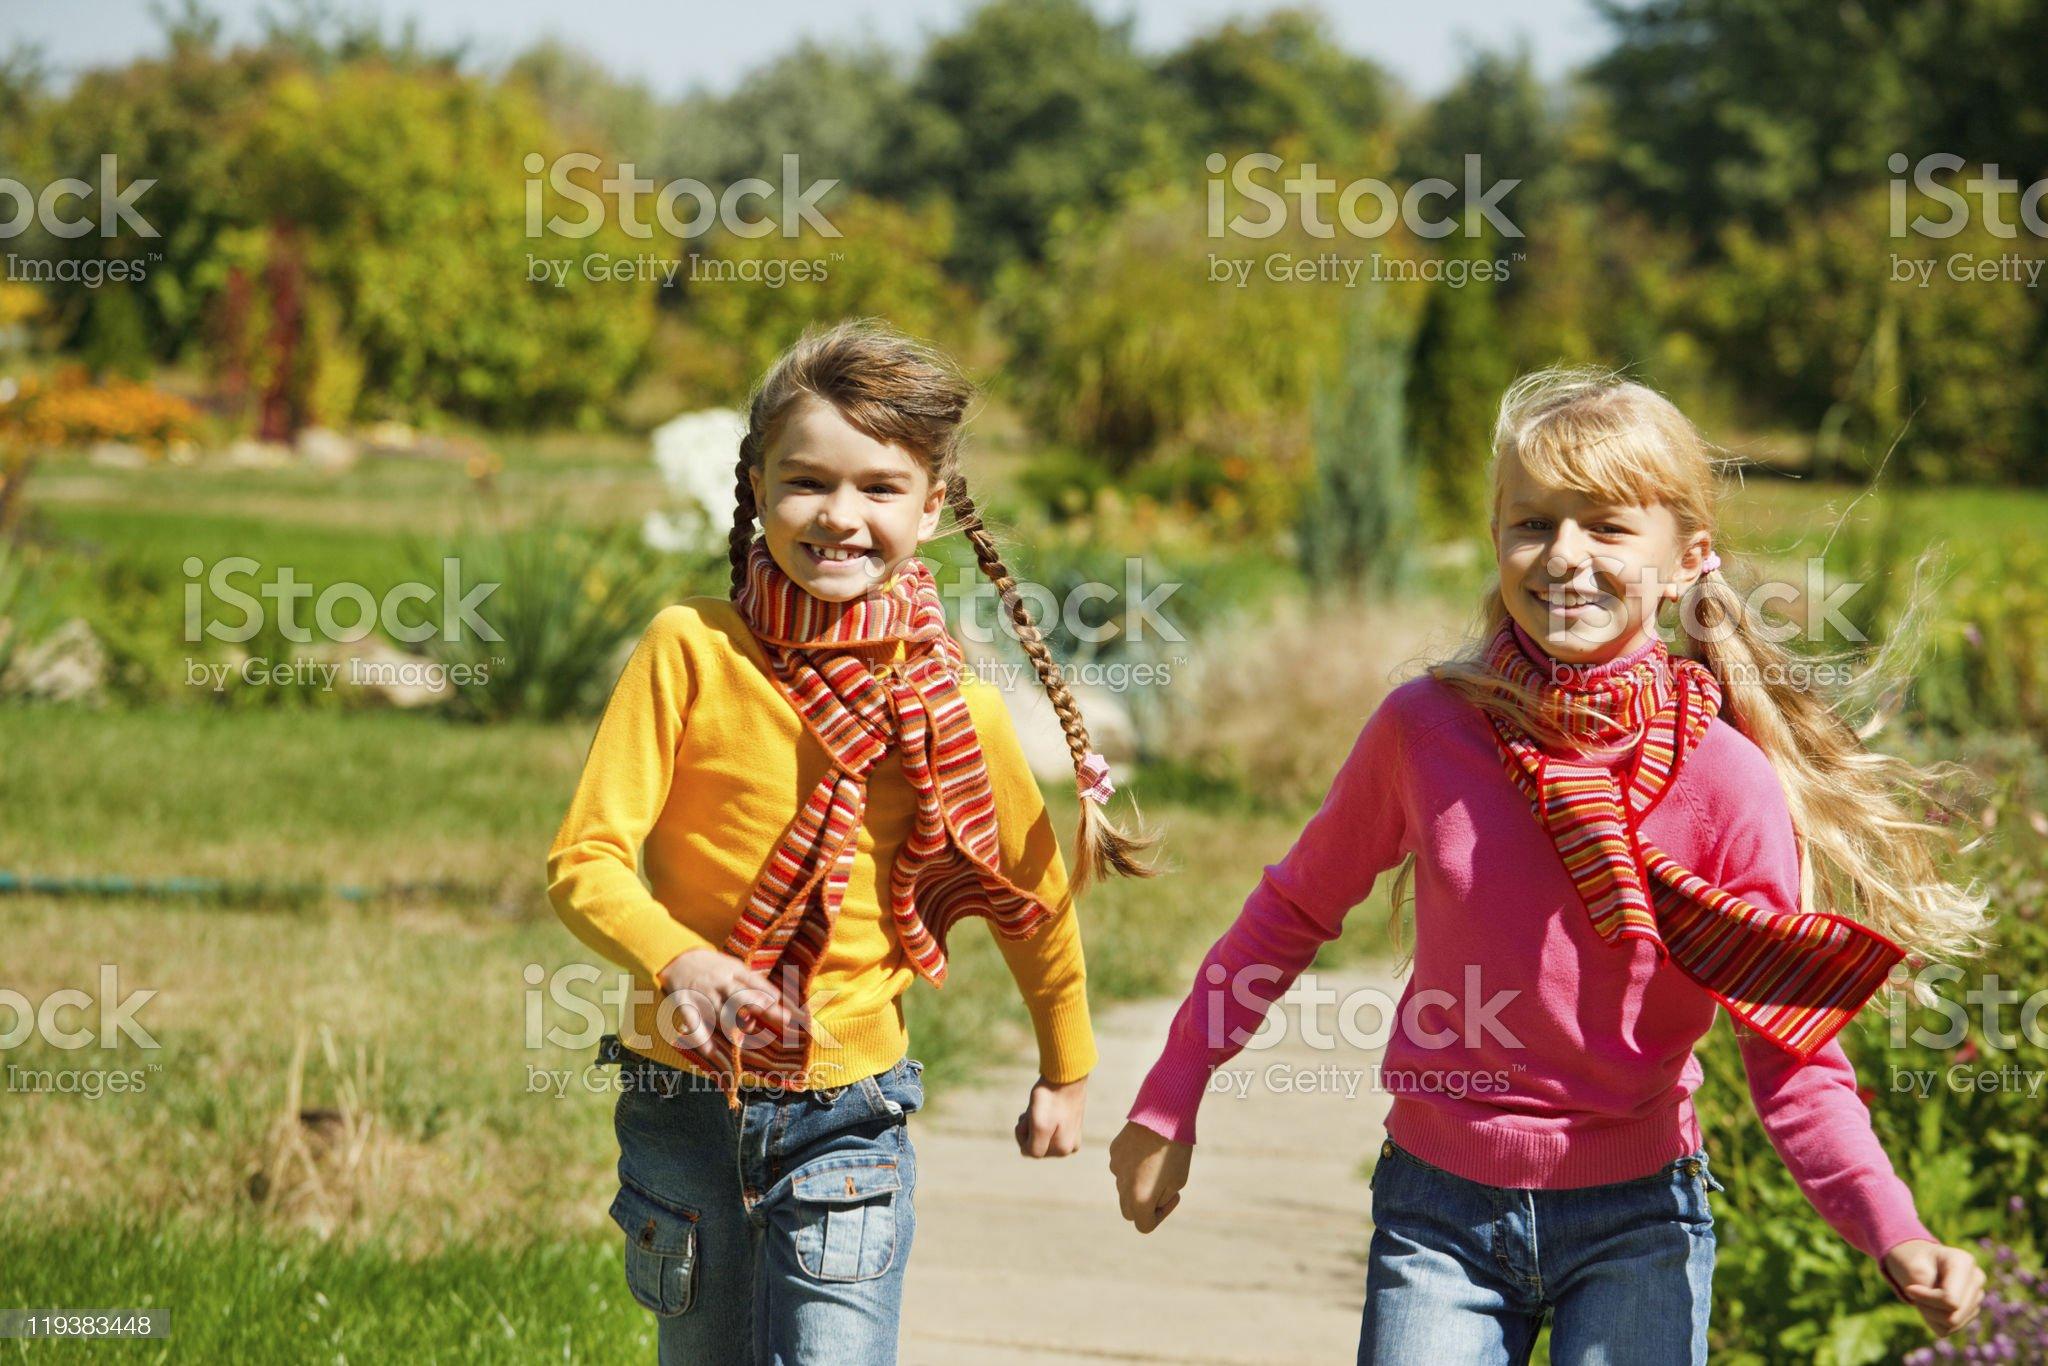 Girls running royalty-free stock photo